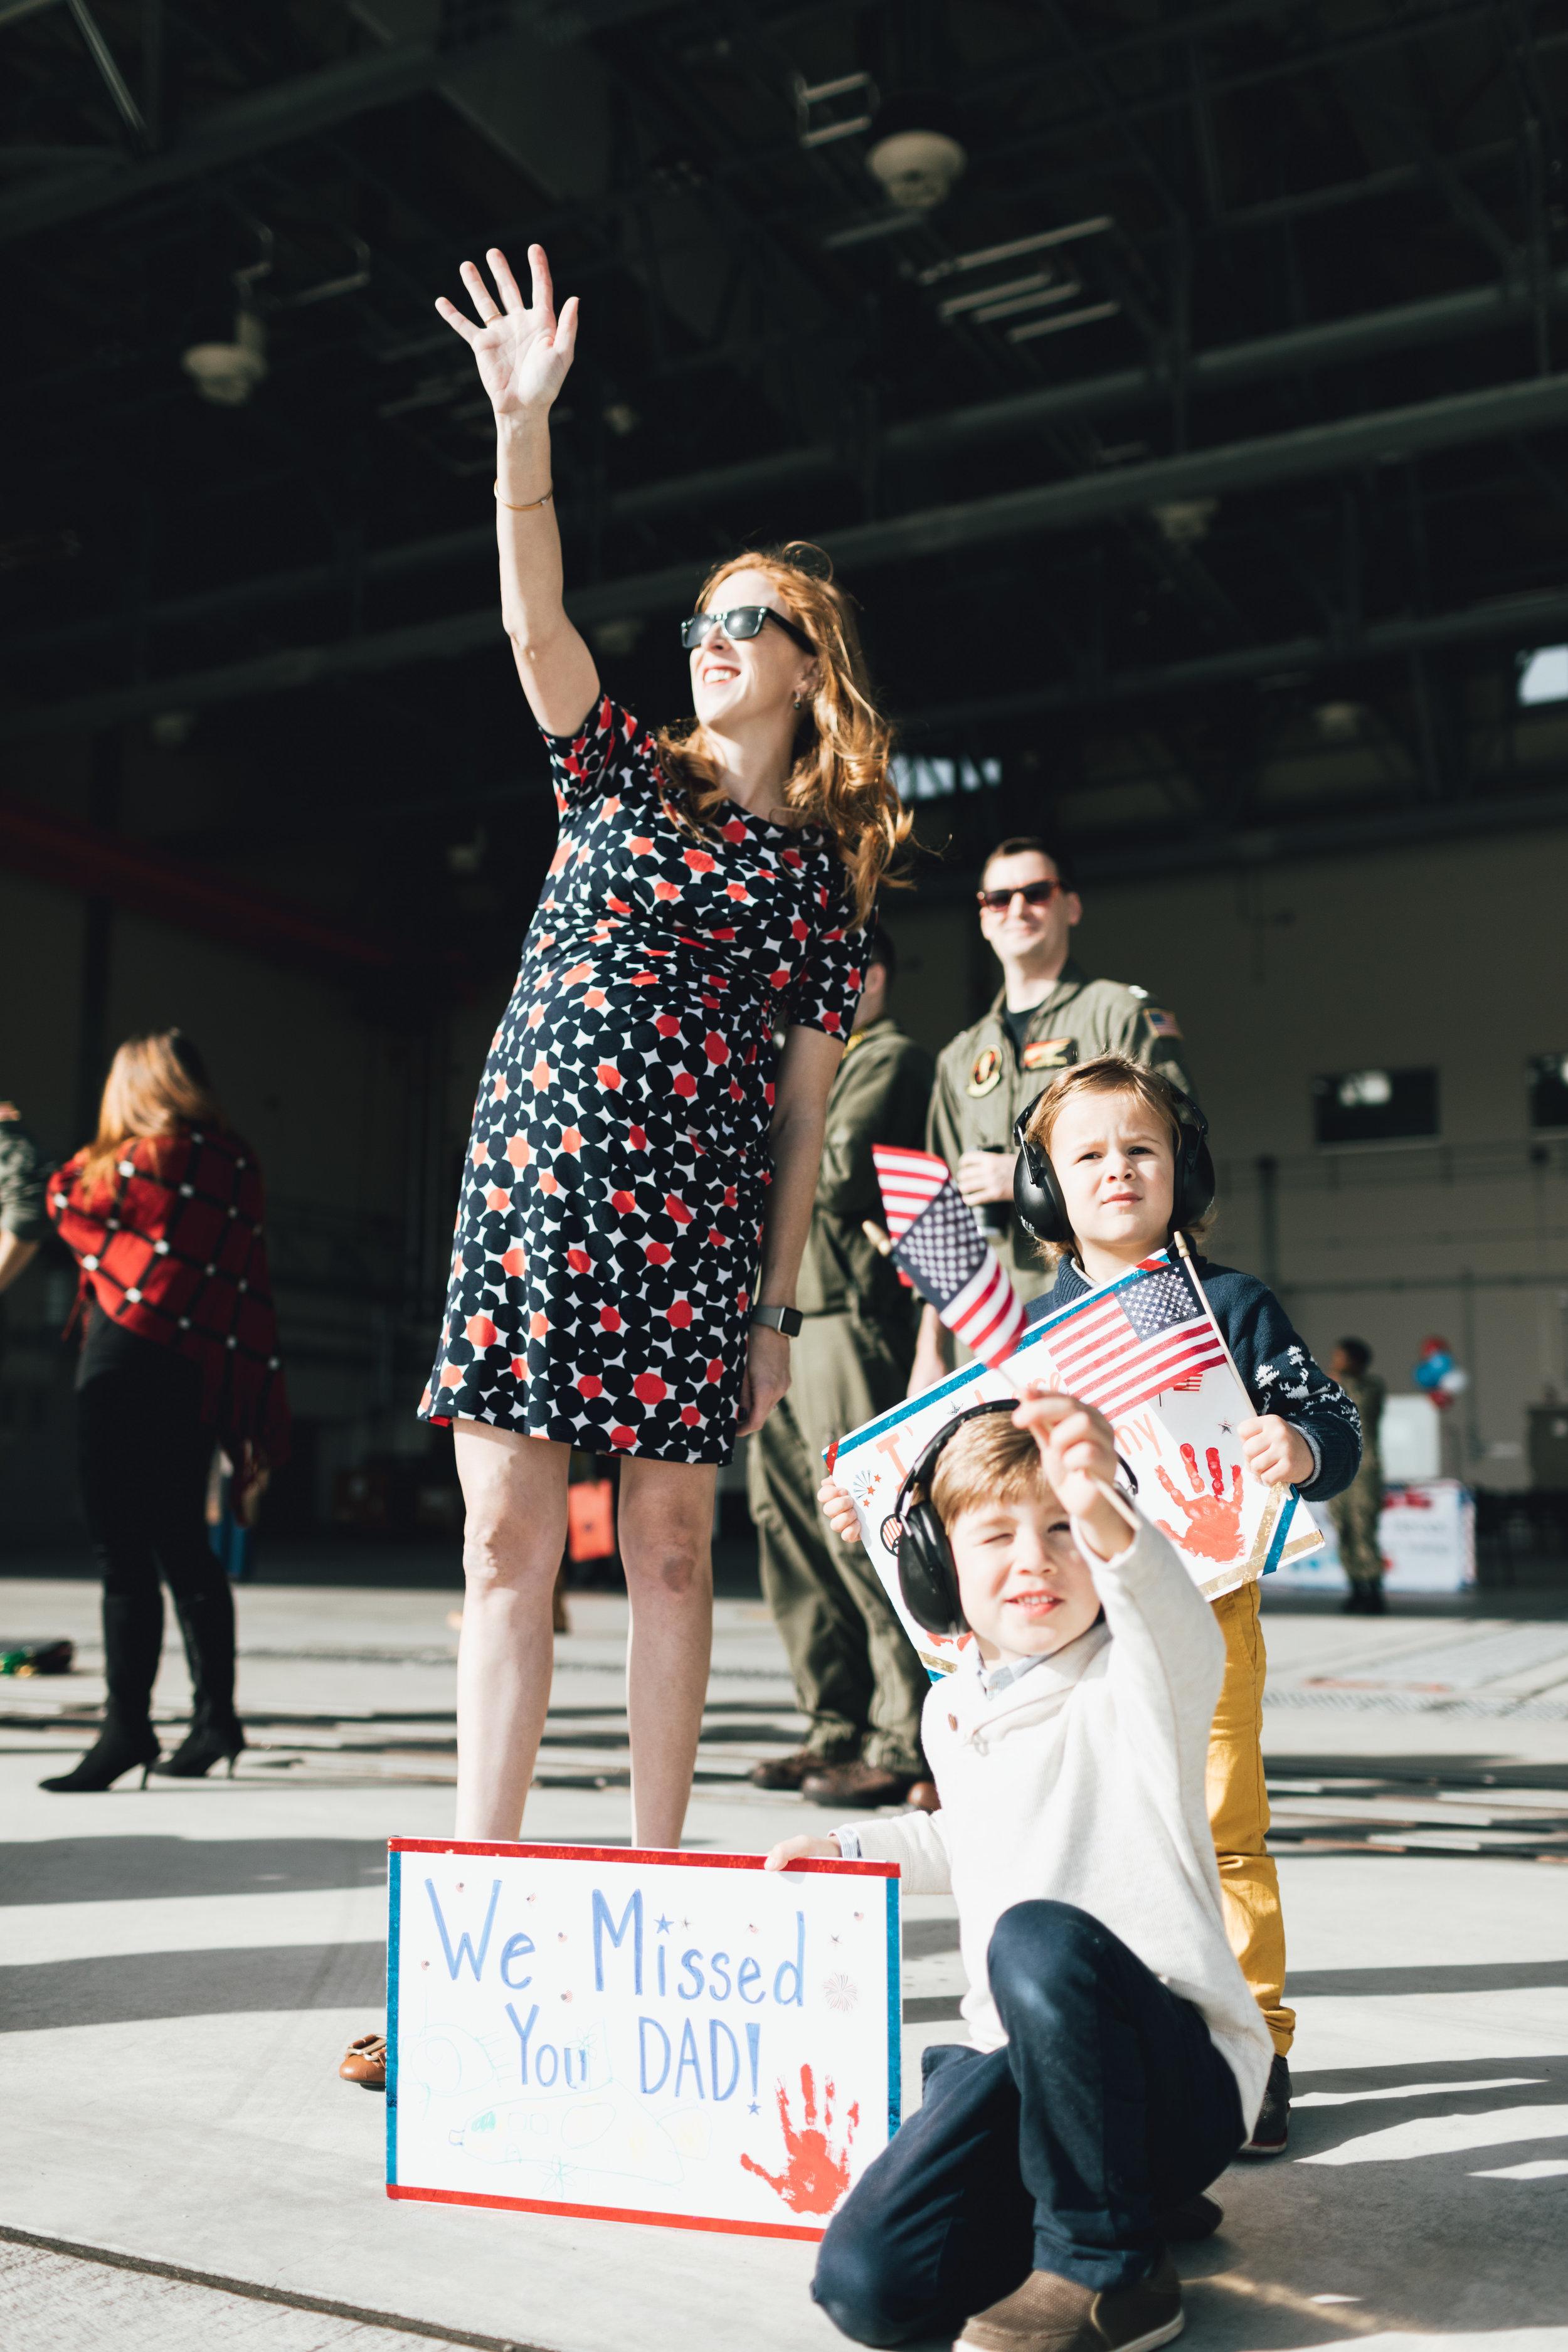 military-homecoming-signs-photos-by-samantha-look.jpg